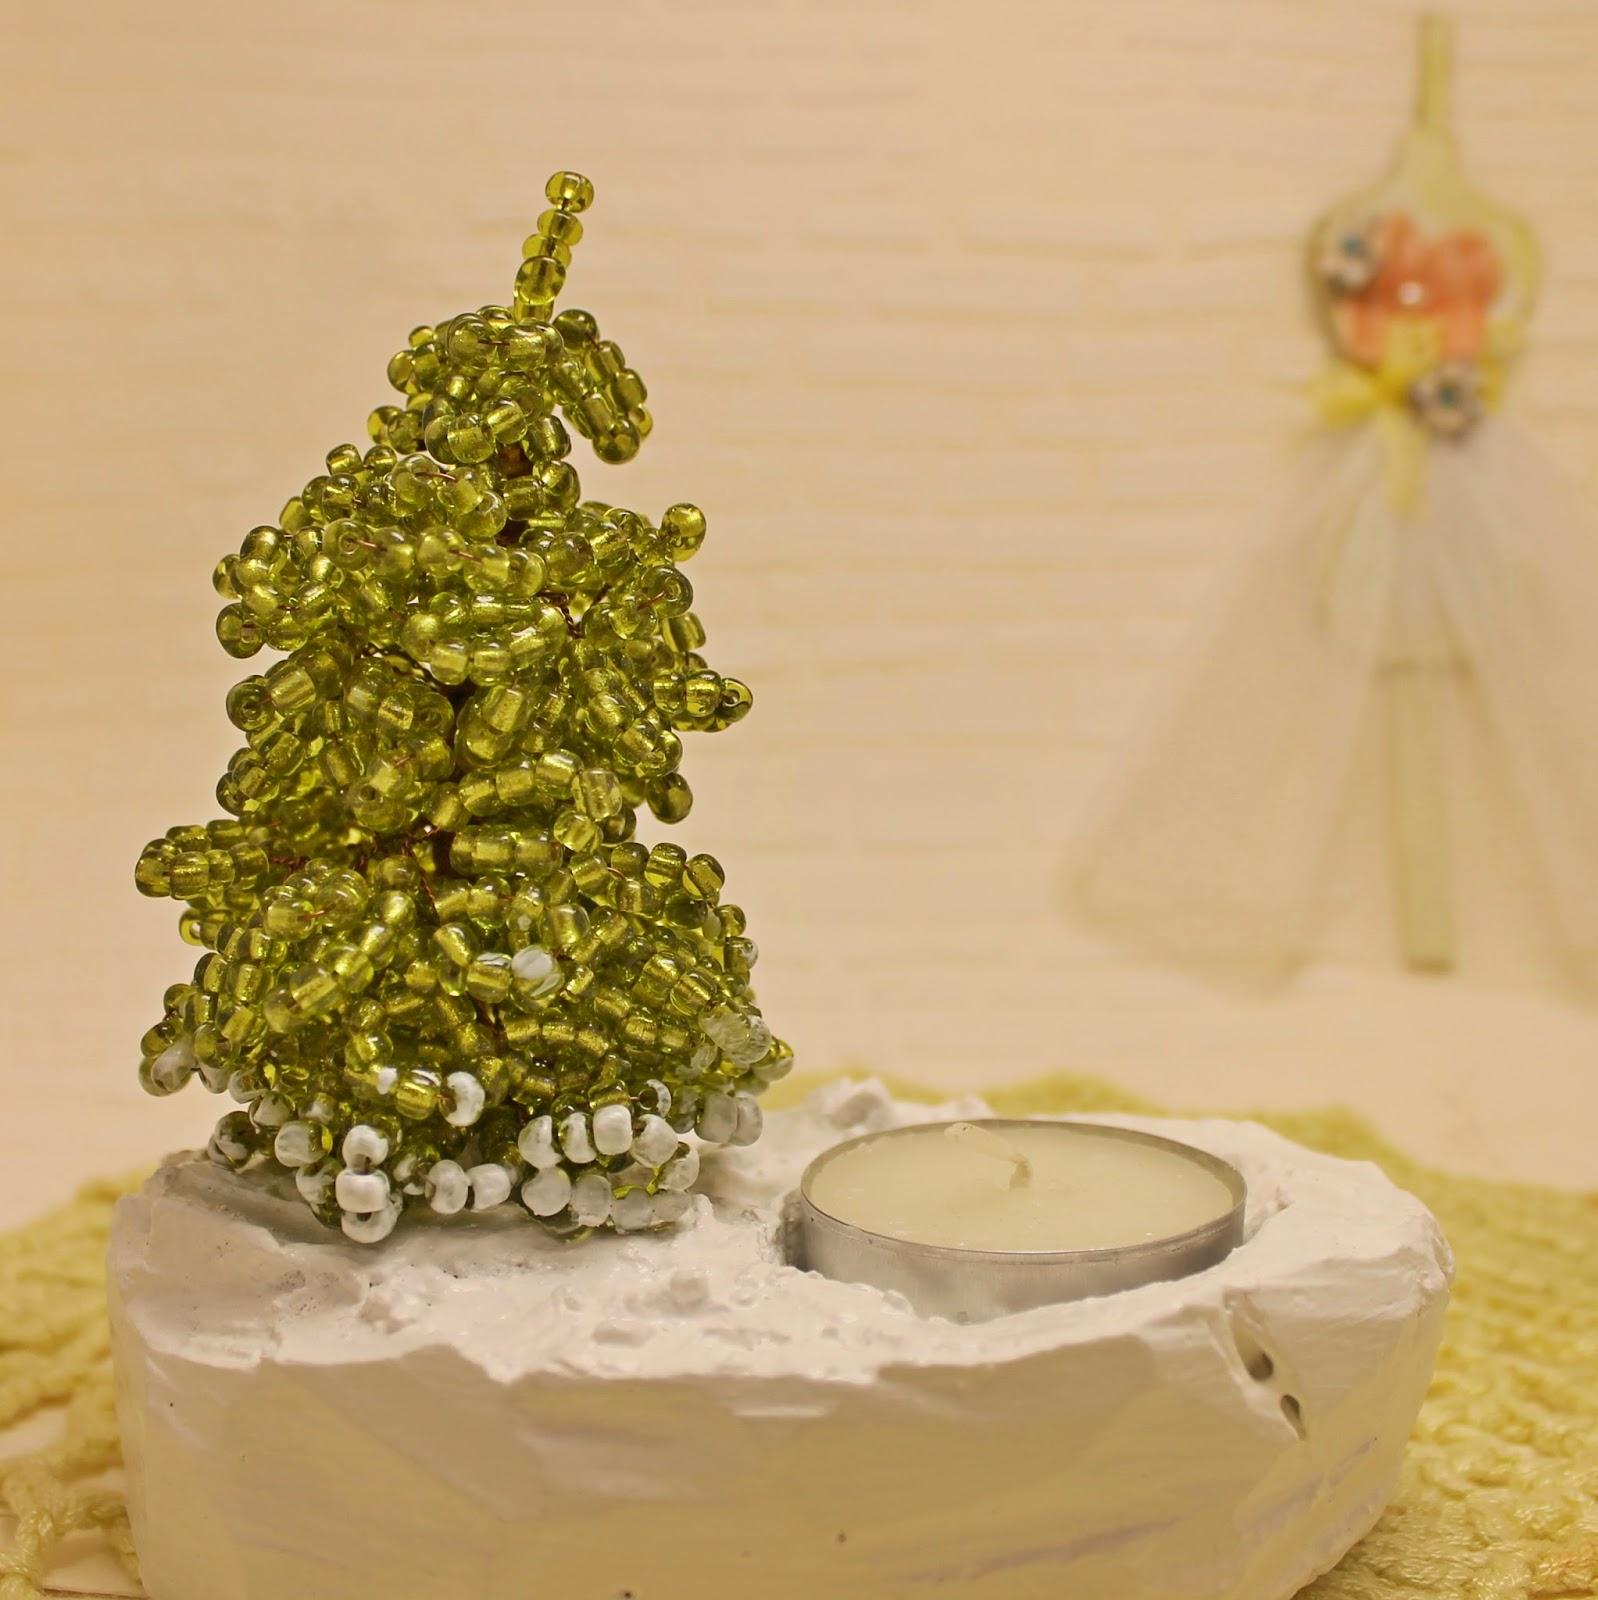 http://ilmirahasanova.blogspot.ru/2014/12/blog-post_20.html